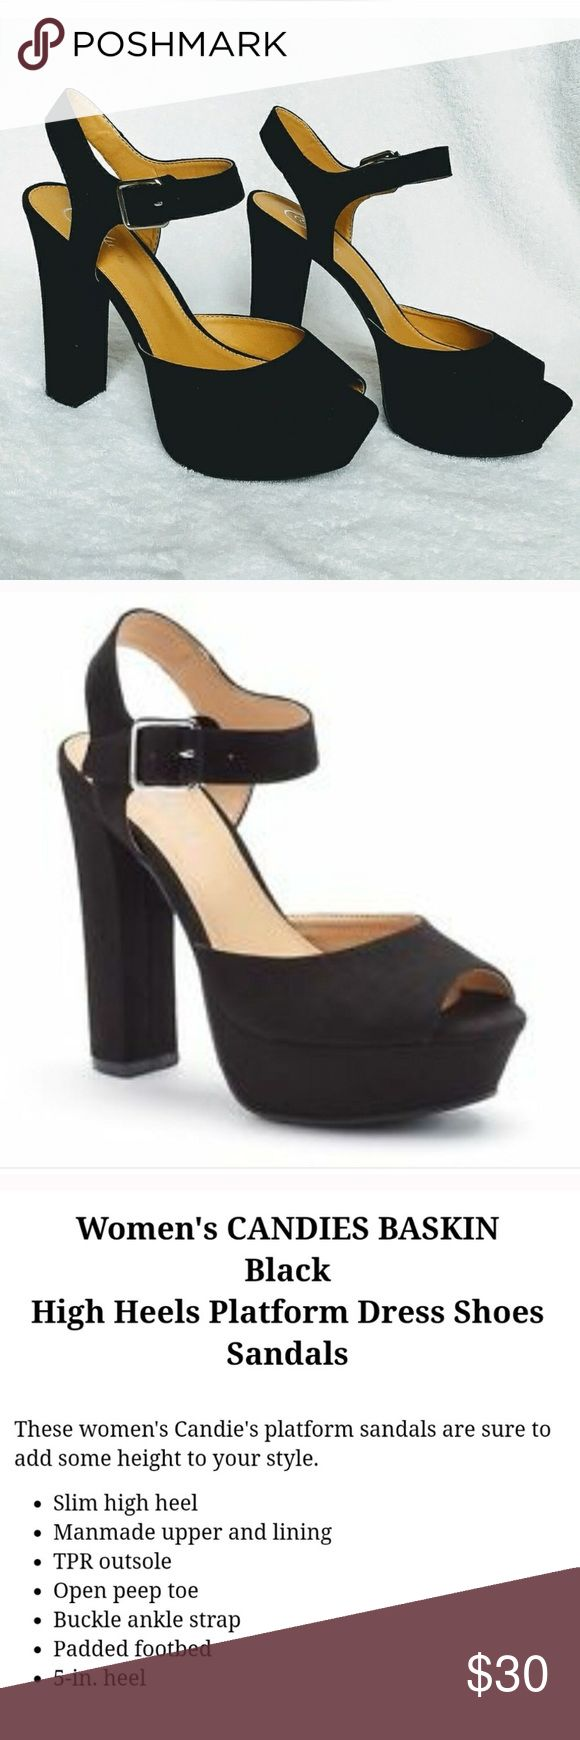 Platform black heels Black suede platform heels. Brand- candies by Kohl's. Listed as Steve Madden for views Steve Madden Shoes Heels